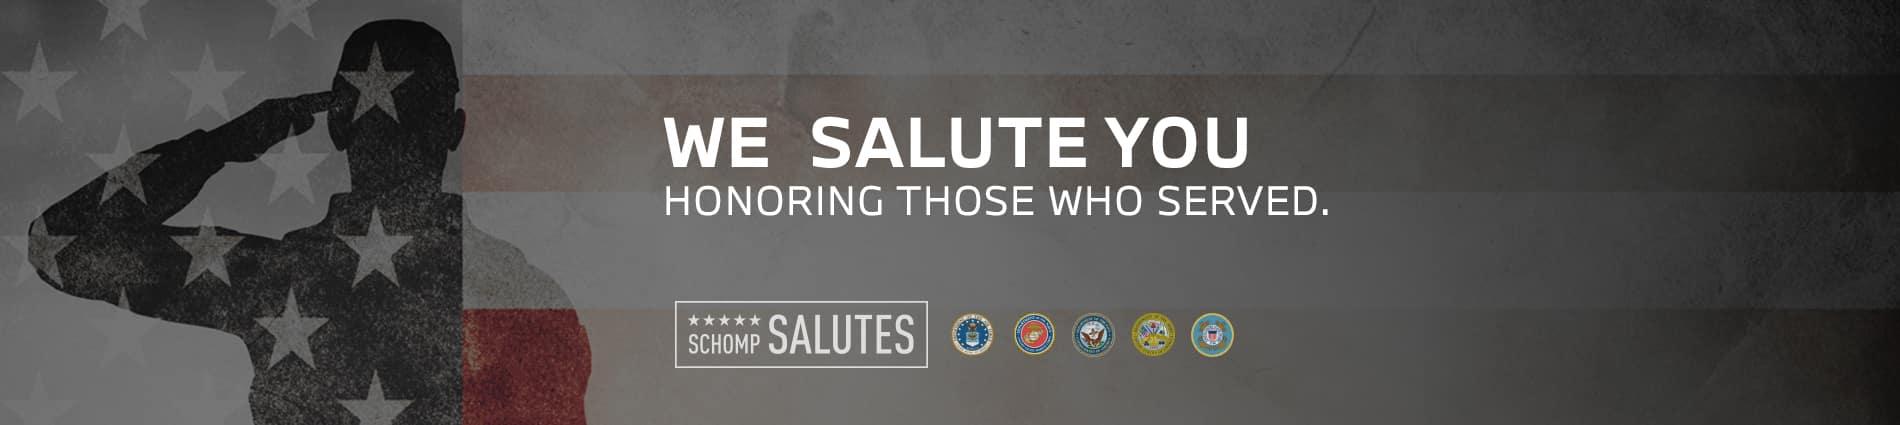 m05-21-bmw-salutes-1900×425